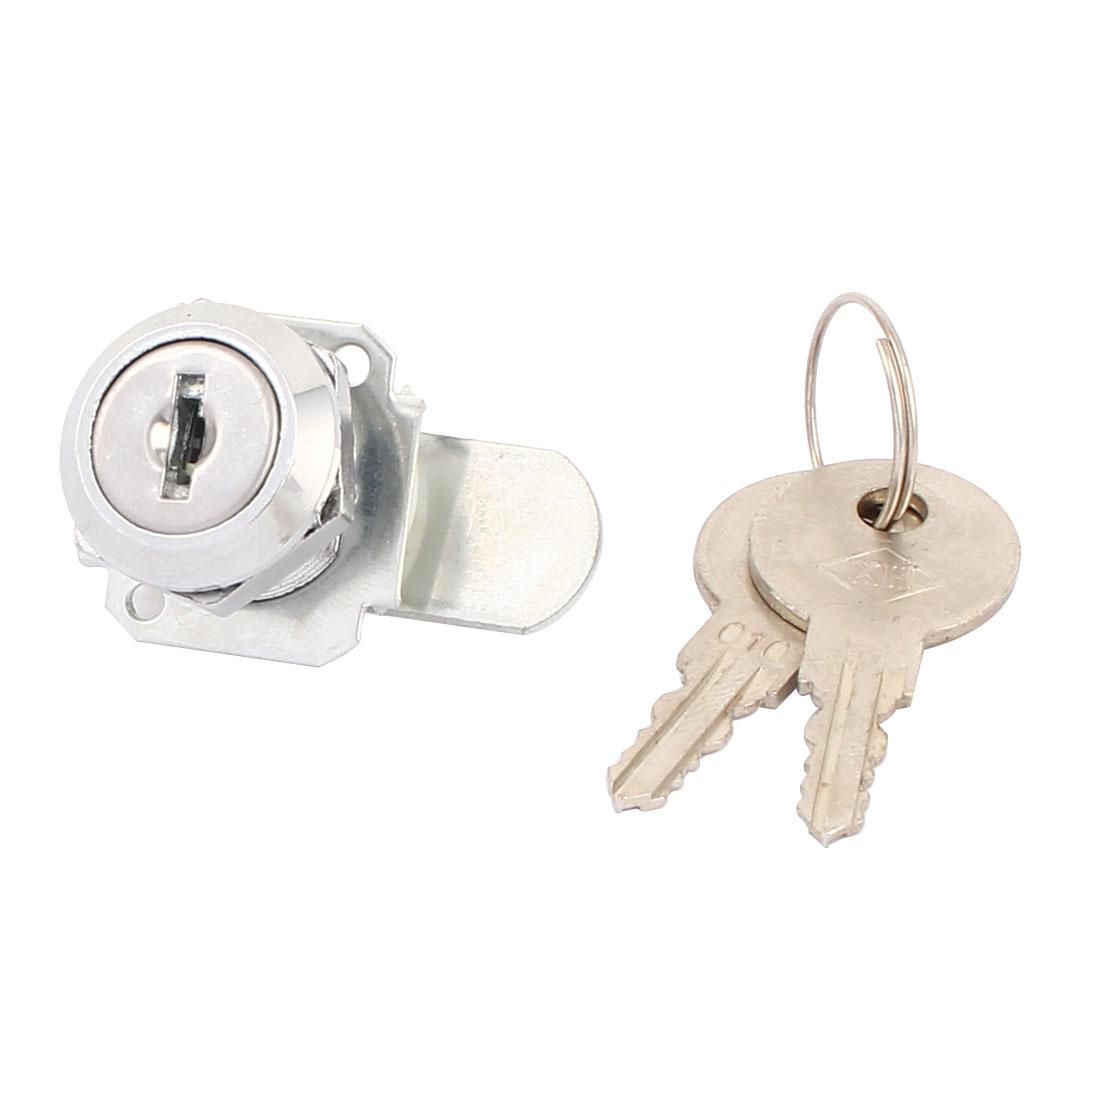 Cupboard Cabinet Mailbox Drawer Door Security Cam Chest Lock Camlock w 2 Keys